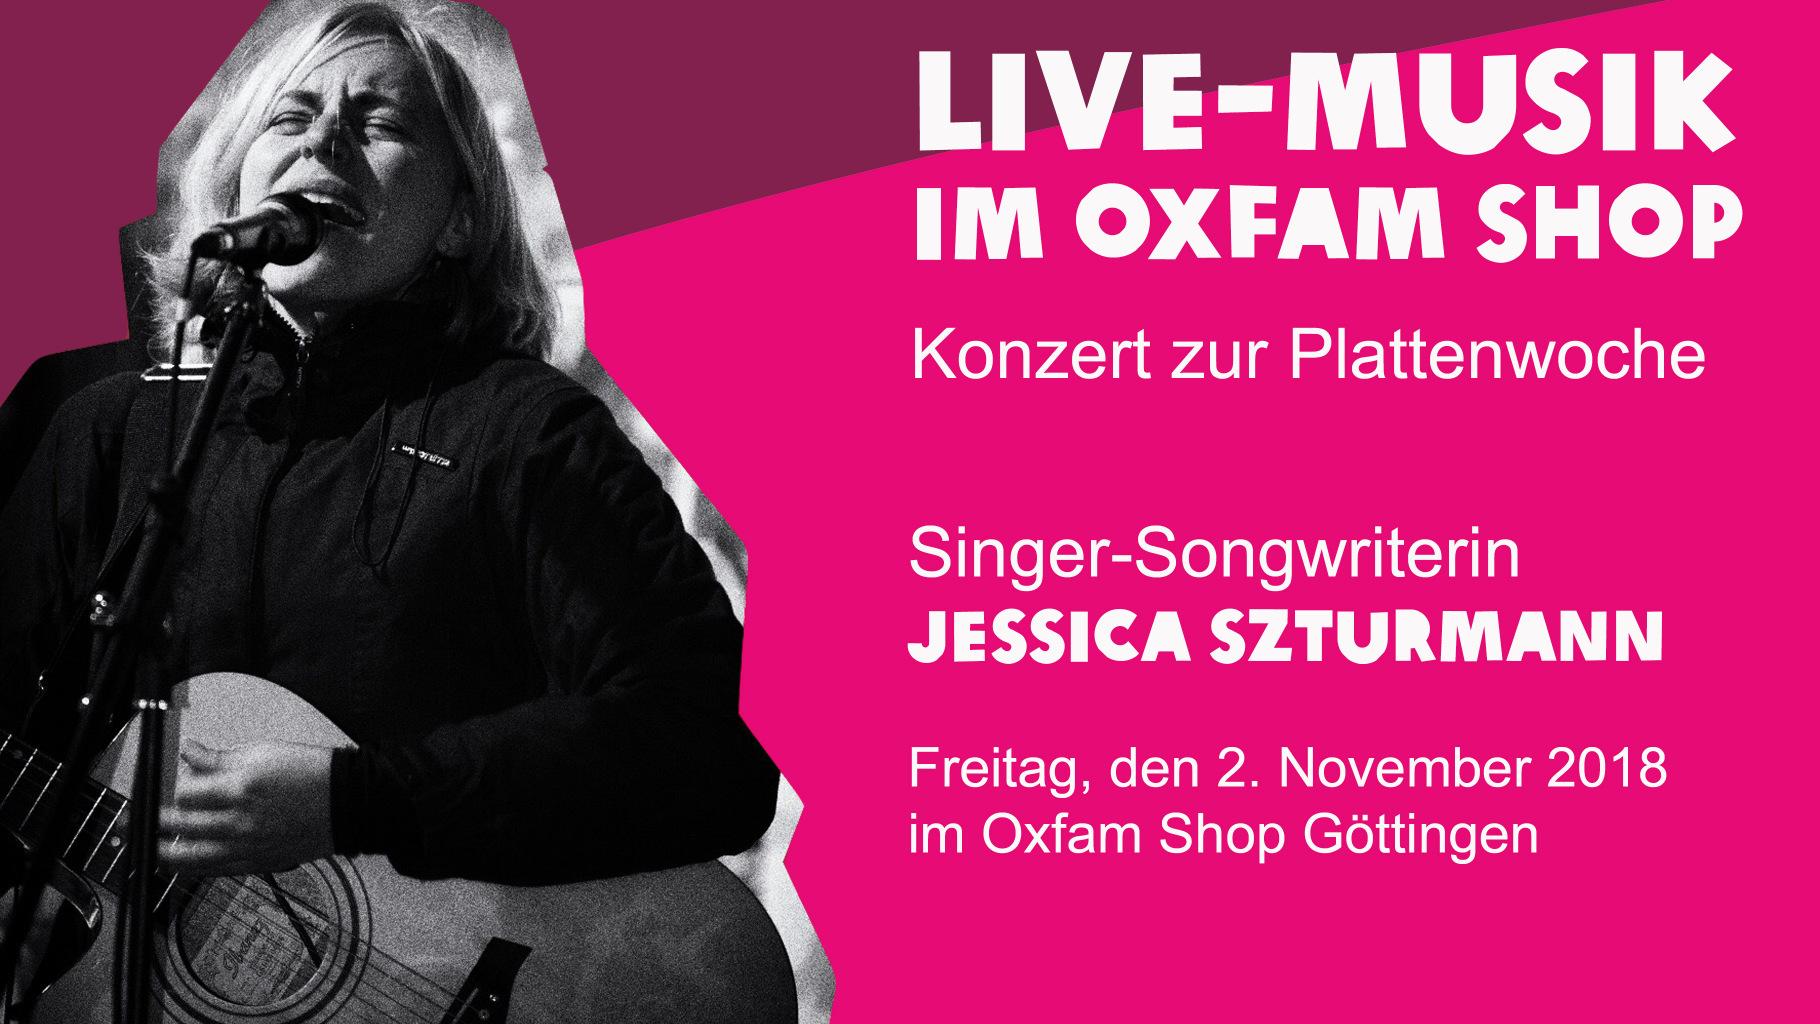 Live-Musik im Oxfam Shop Göttingen Jessica Stzurmann